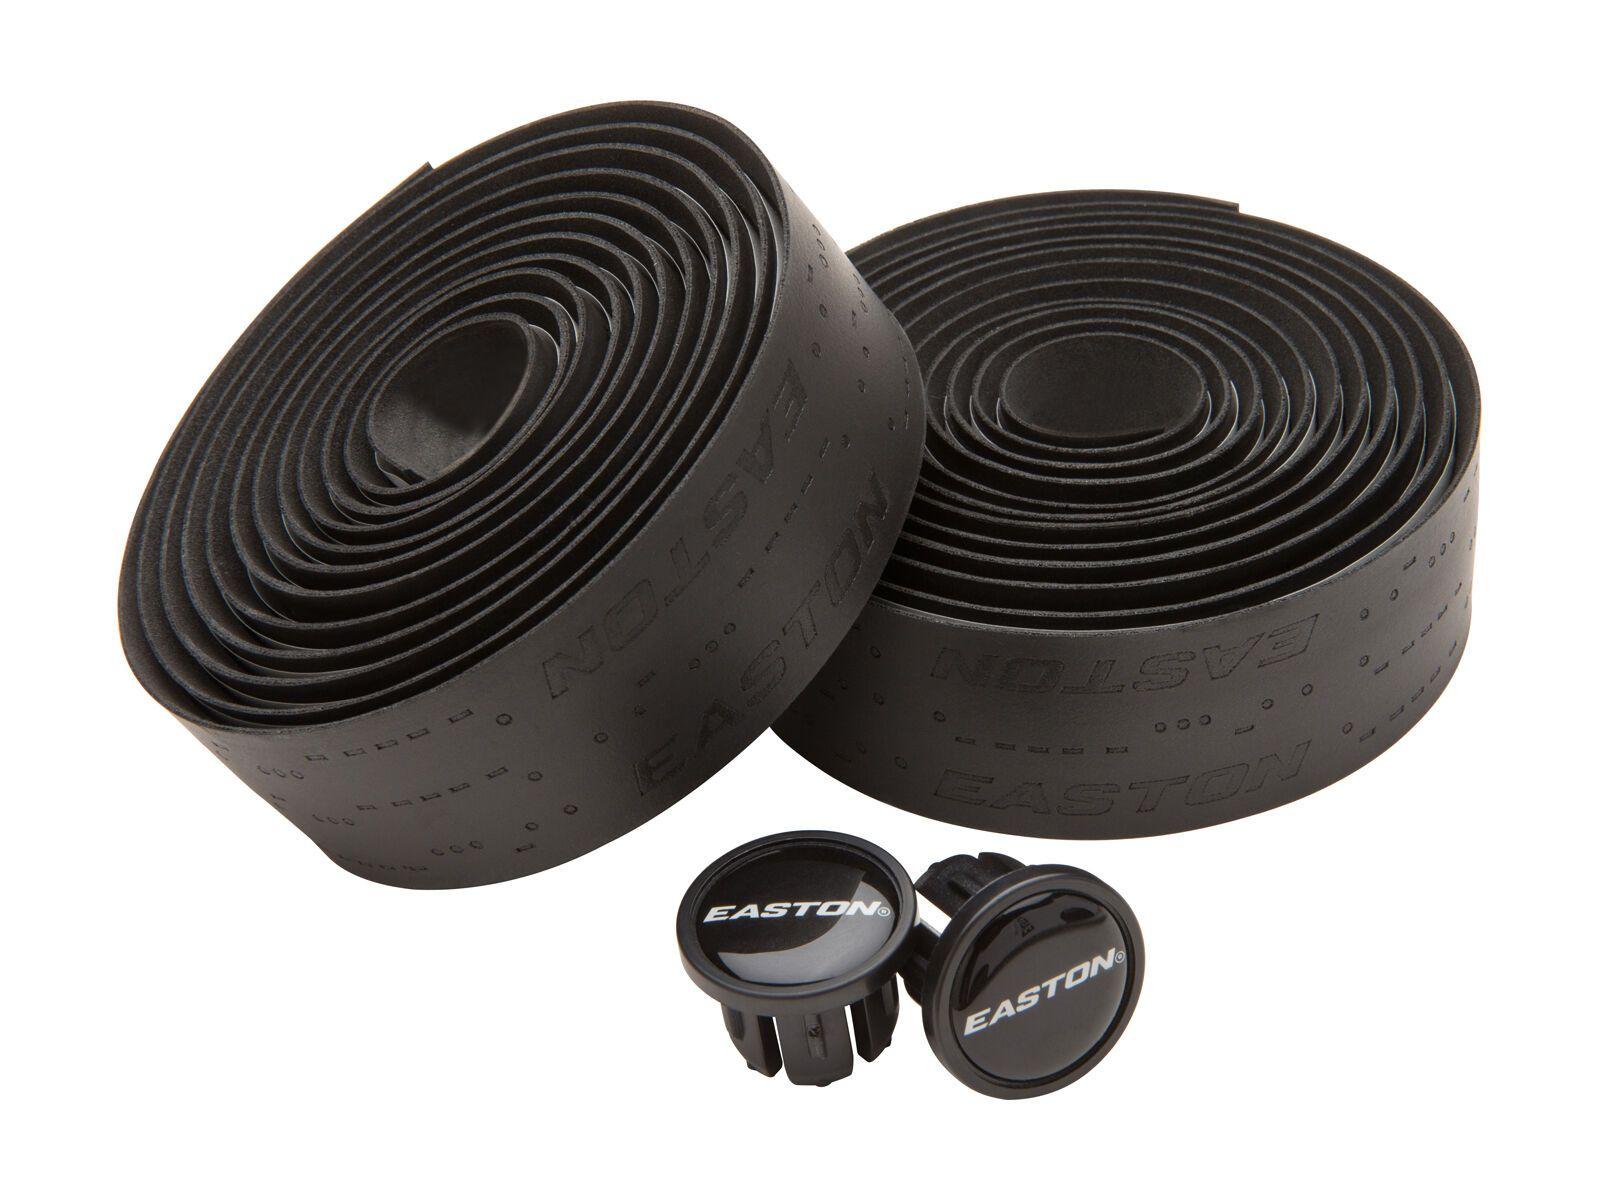 Easton Microfiber Tape black 502038498